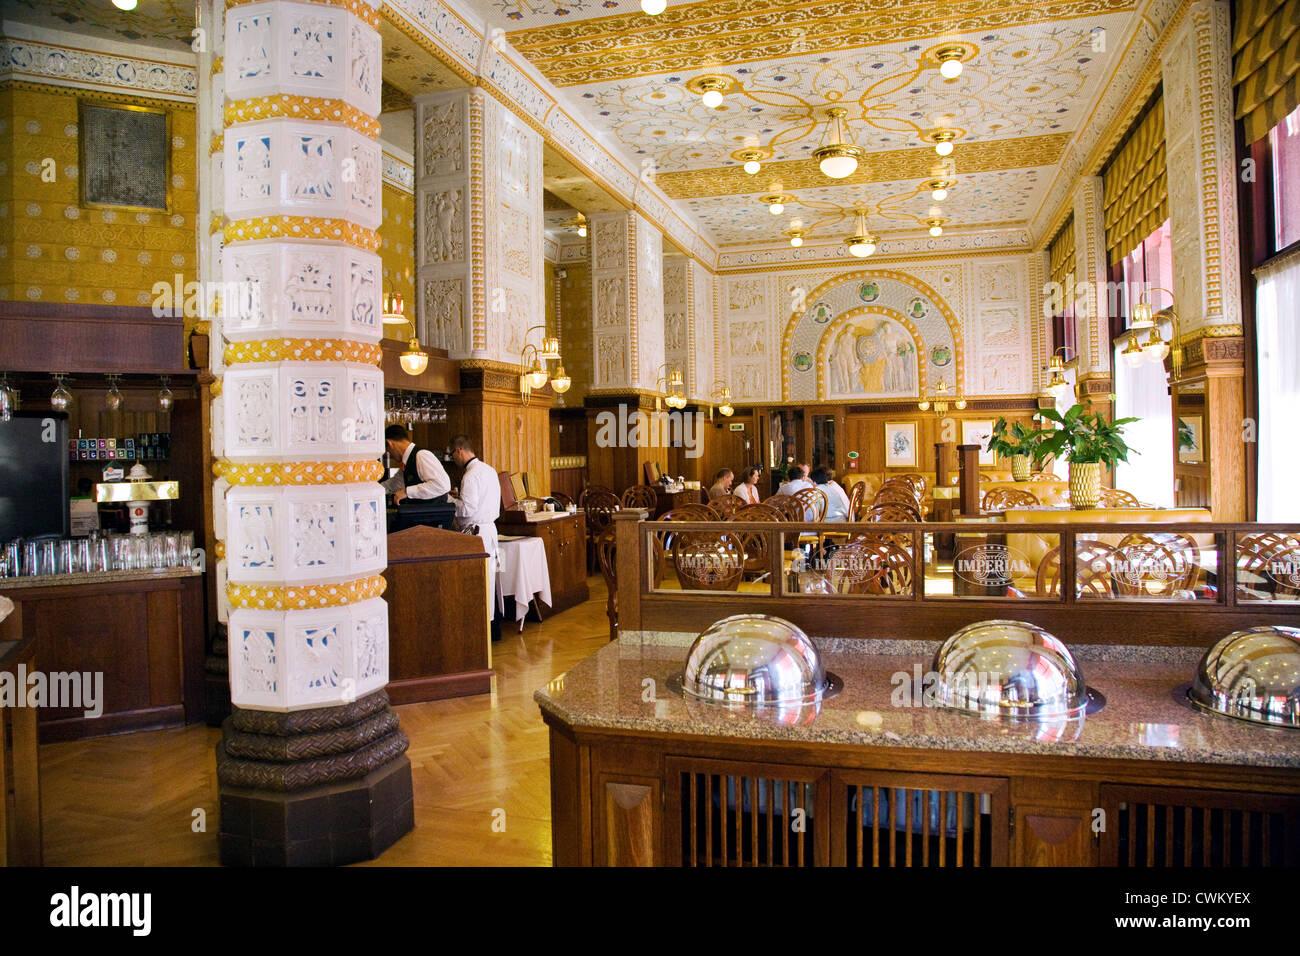 nouveau cafe restaurant prague deco imperial hotel praha stock photo royalty free